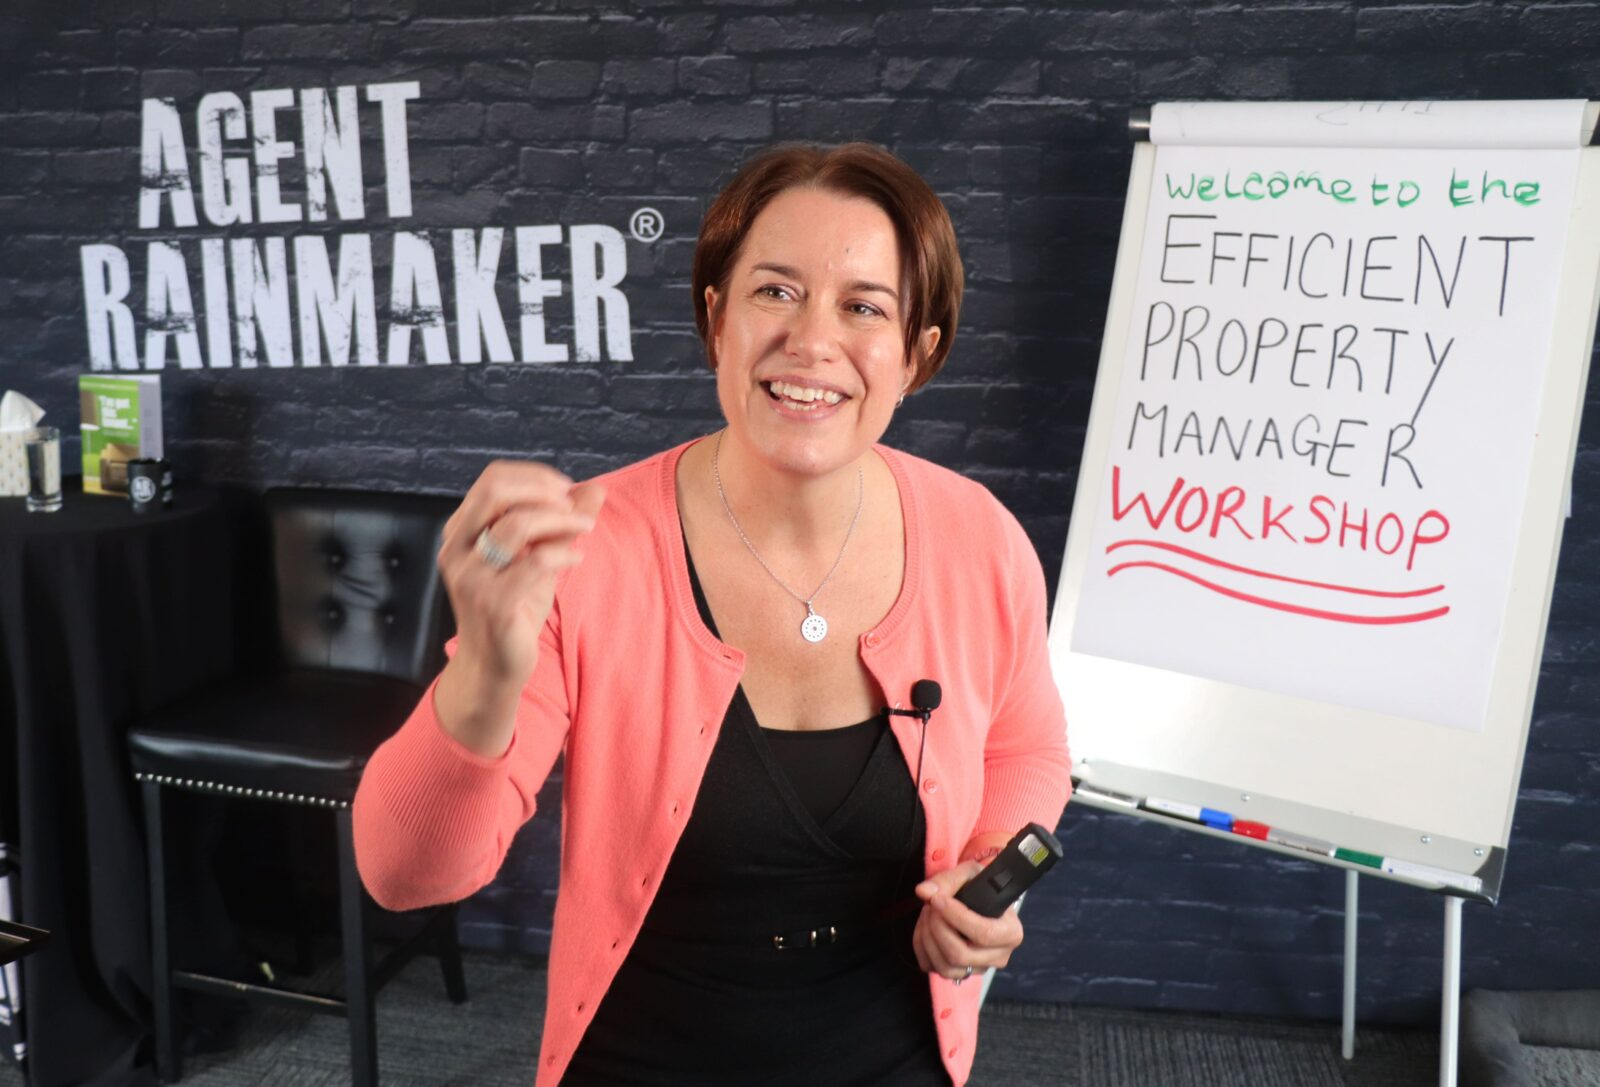 The Efficient Property Manager Workshop